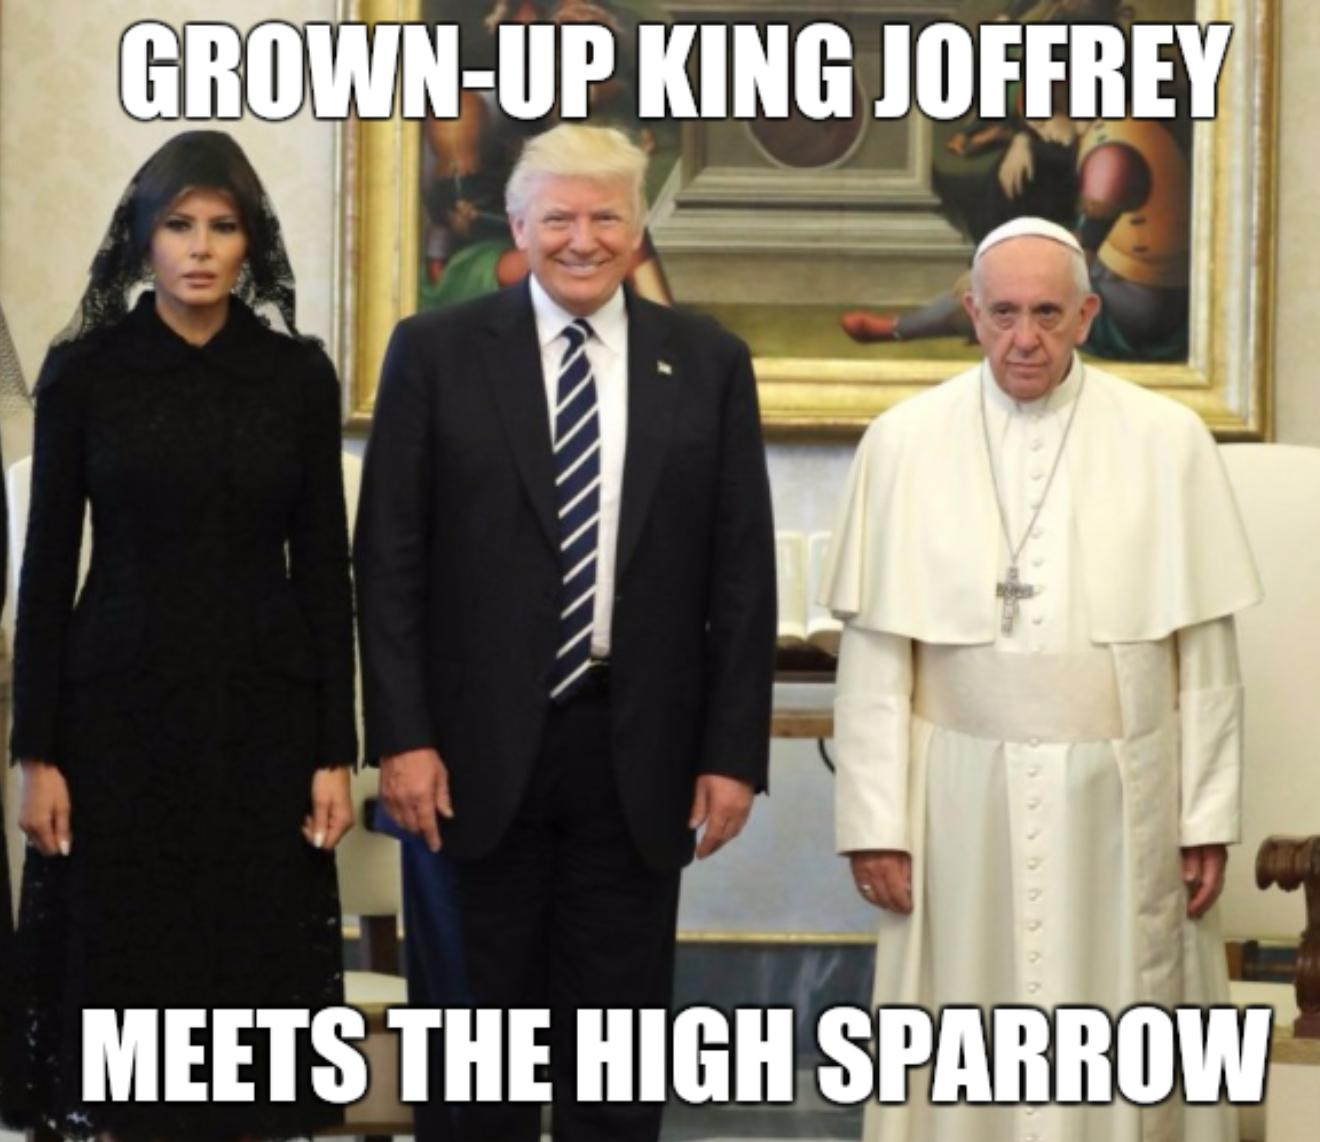 King Joffrey & High Sparrow